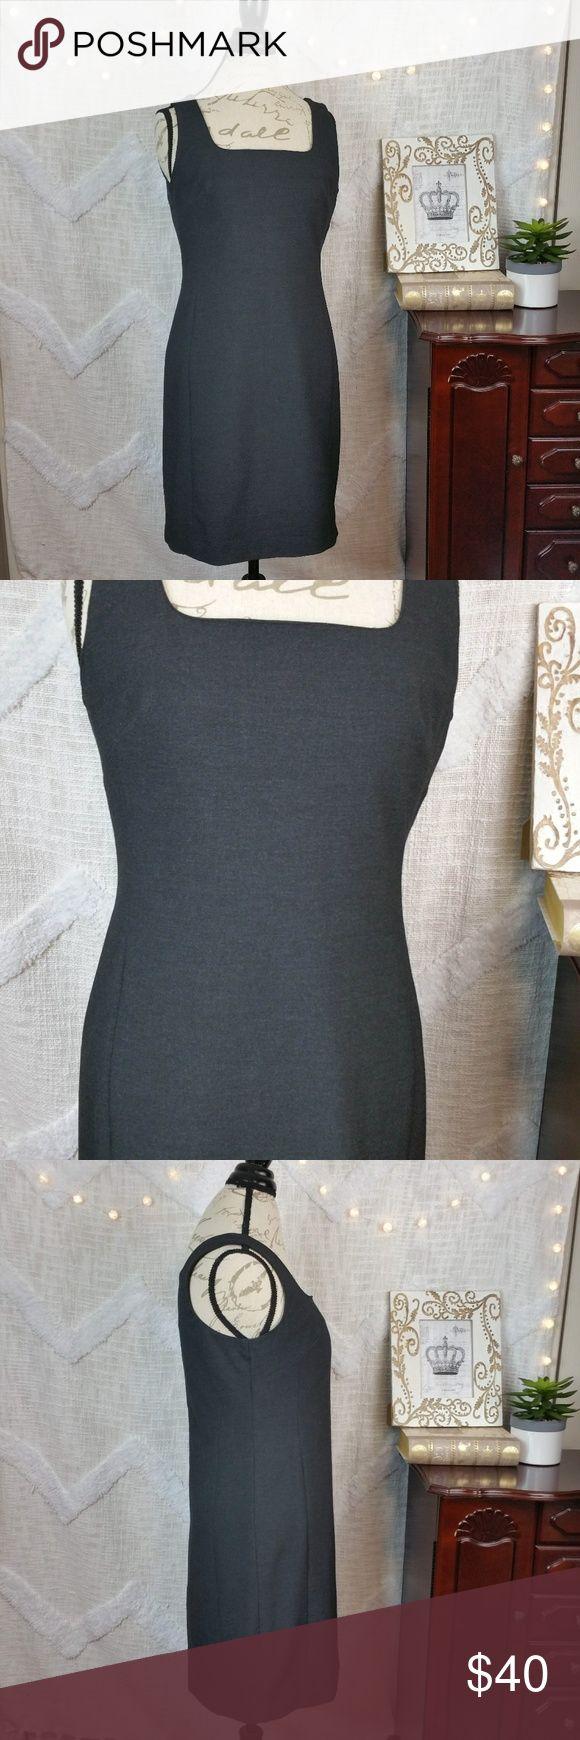 FLASH SALE* Liz Claiborne basic dress ⚡*FLASH SALE* price